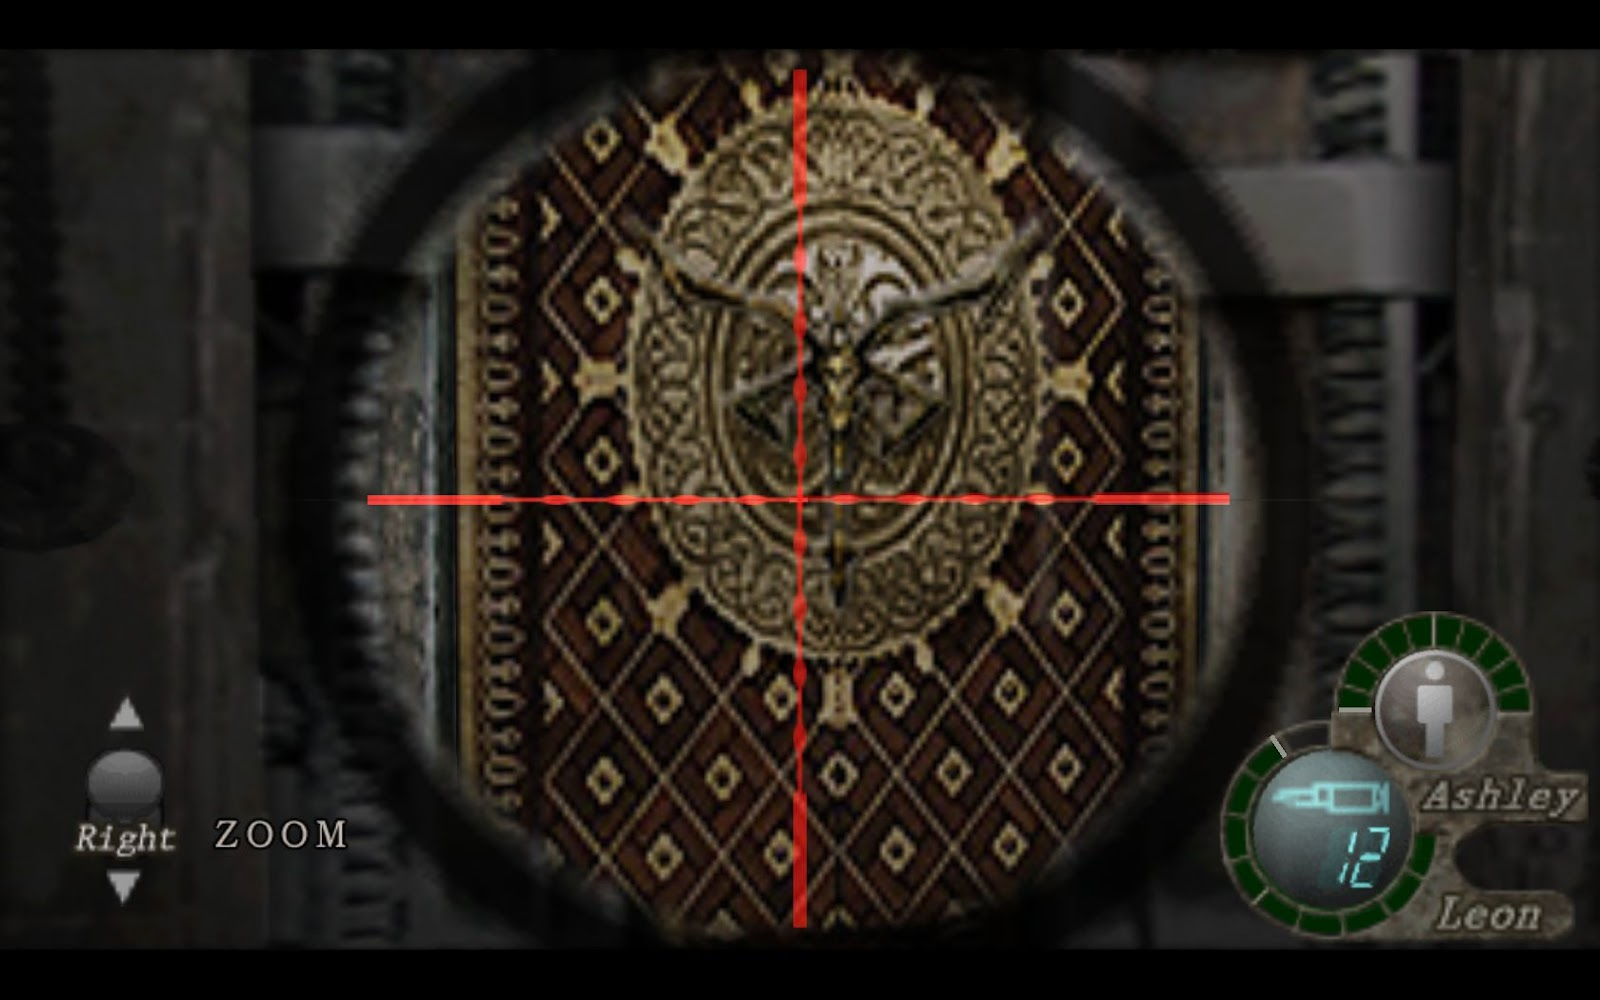 [Image: game_me-2009-11-21-14-48-20-04.jpg]